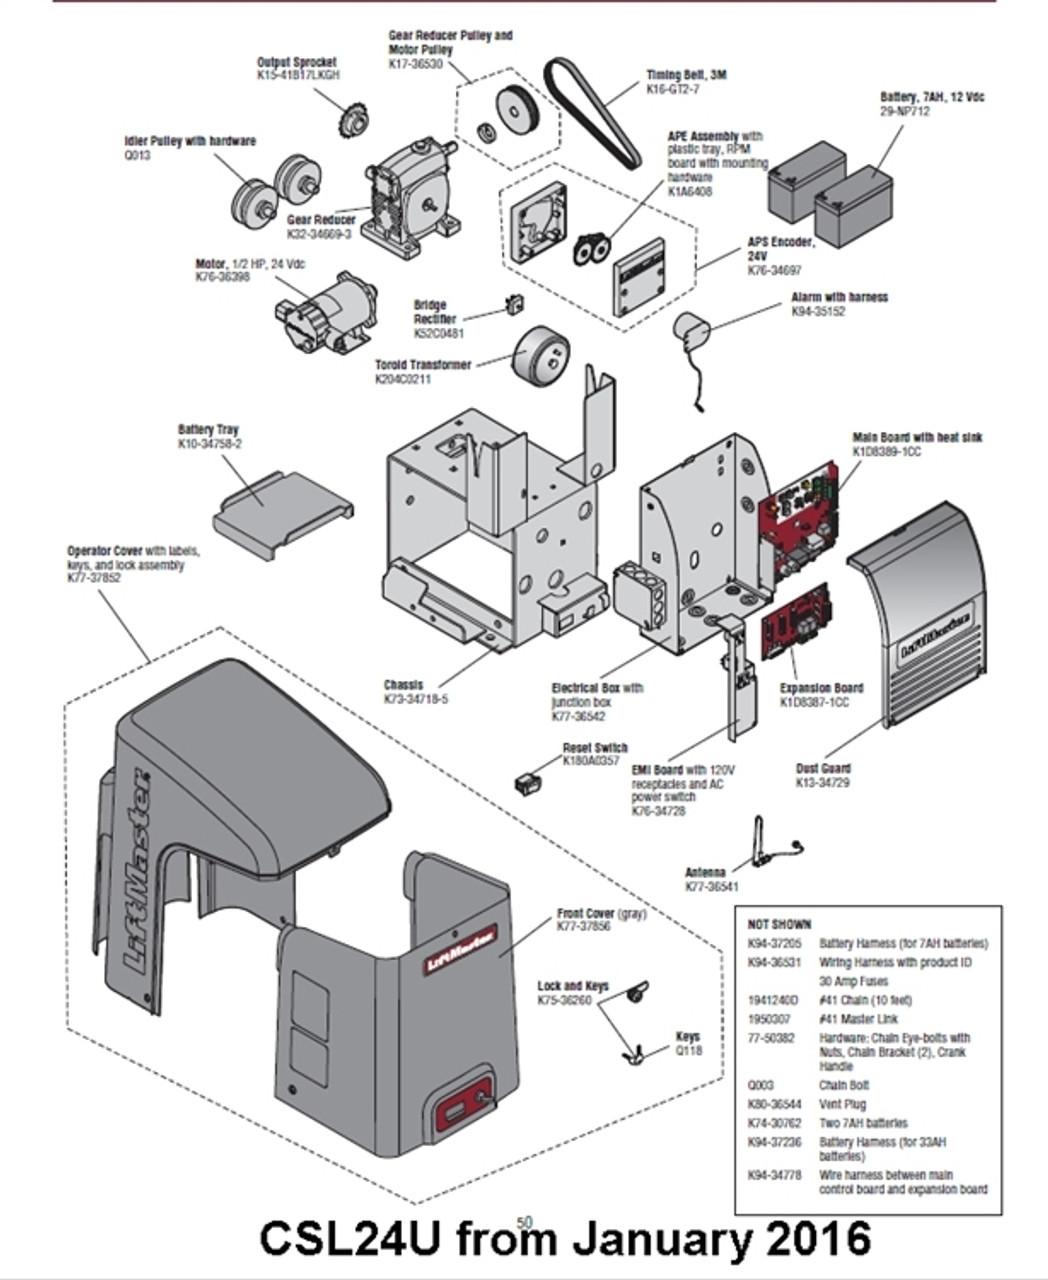 Liftmaster Csl24u Slide Gate Operator Parts Breakdown